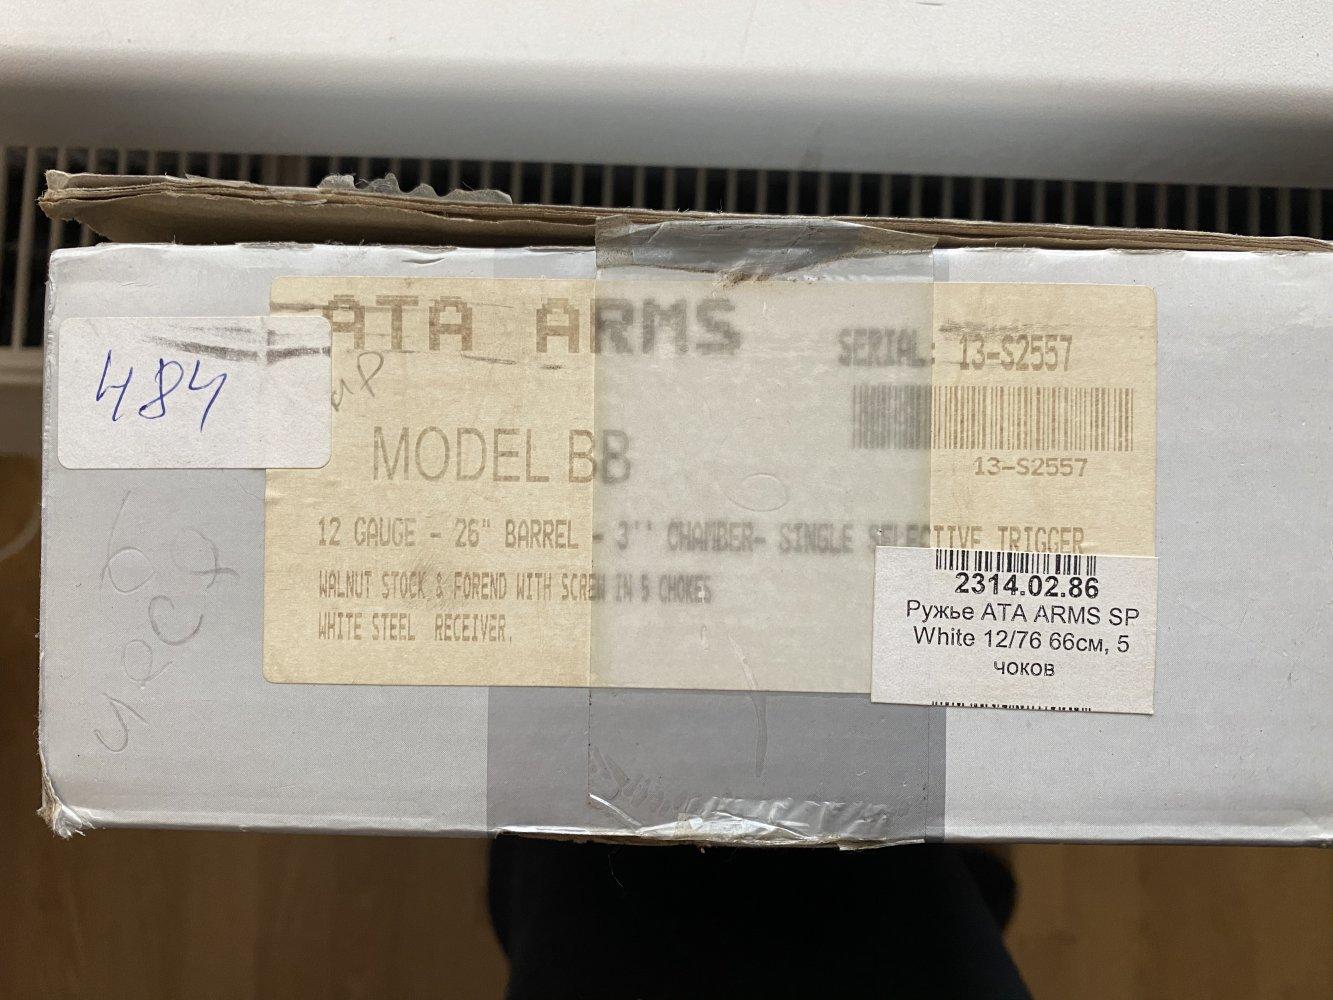 D4EA98A5-BC57-4CDE-B8AE-2EB4DE841E5D.jpeg